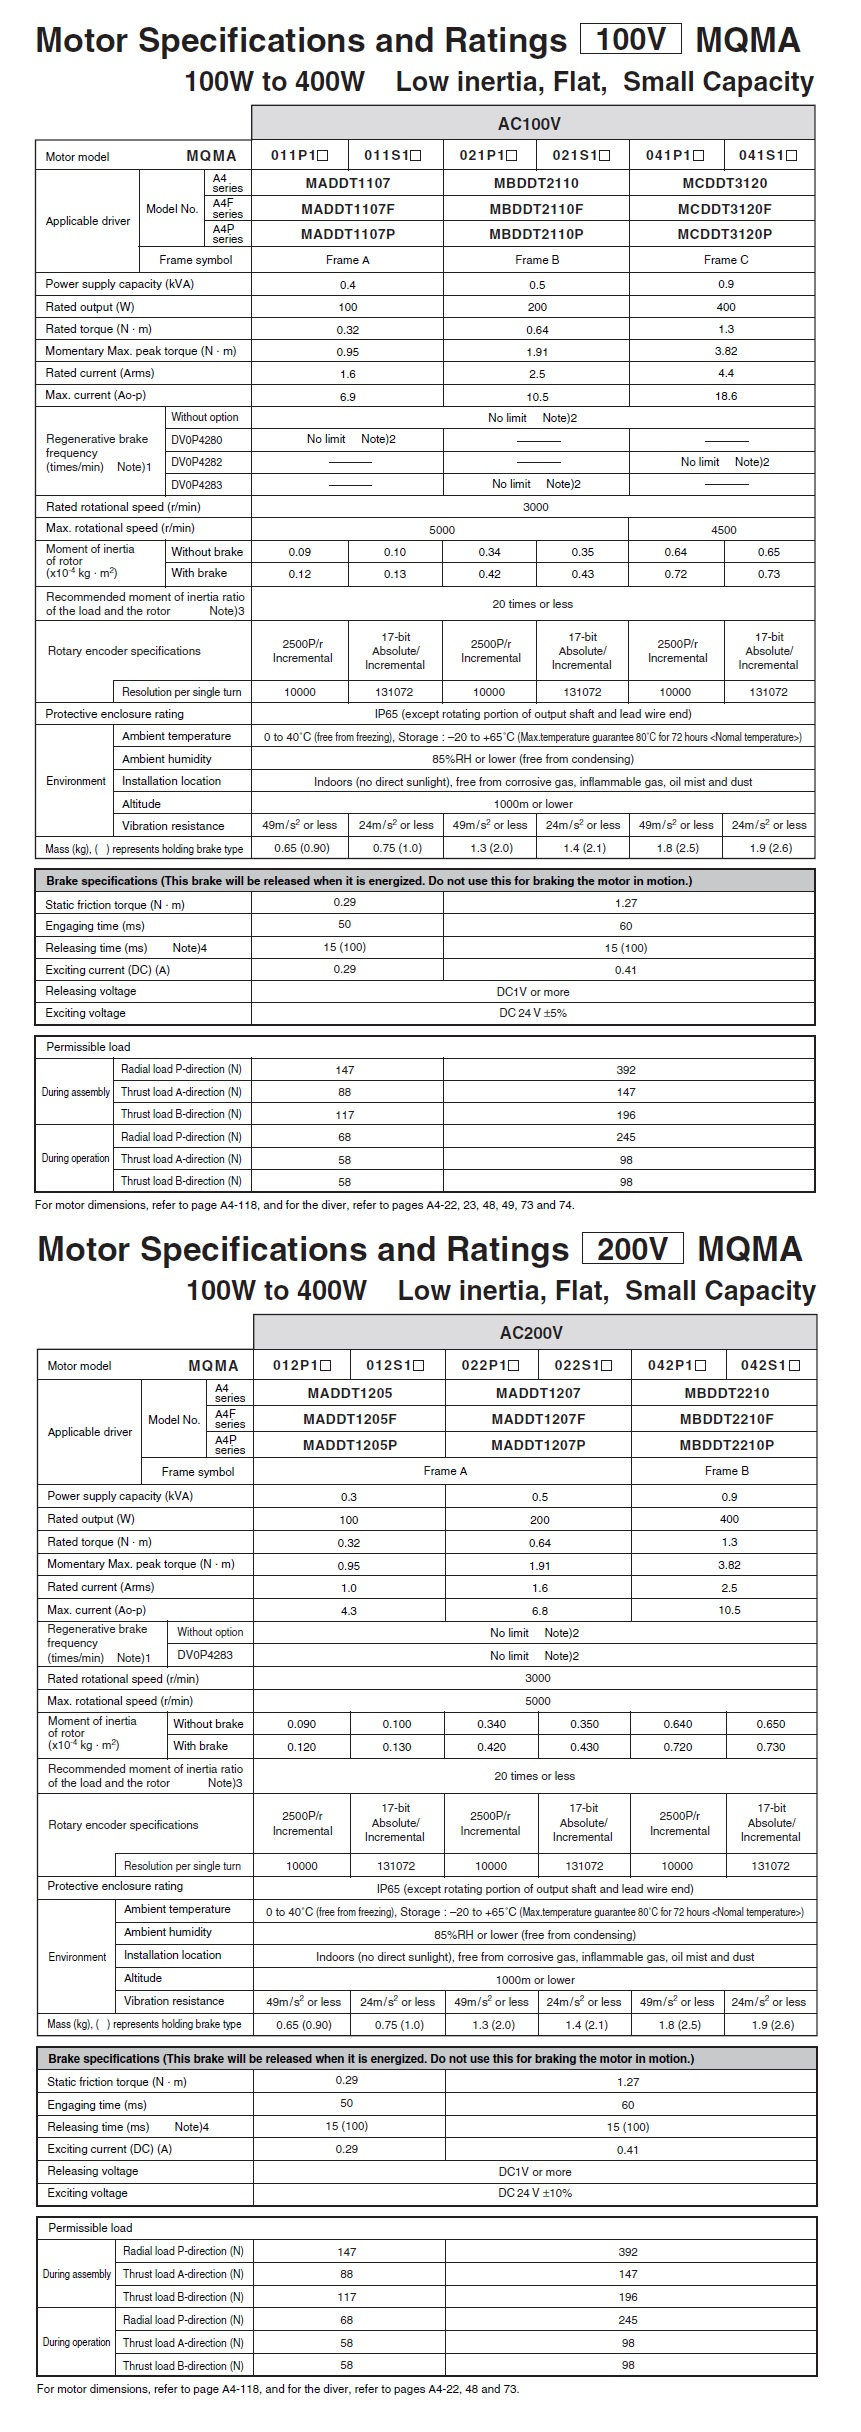 Panasonic: AC Servo Motors (MQMA A4 Series)